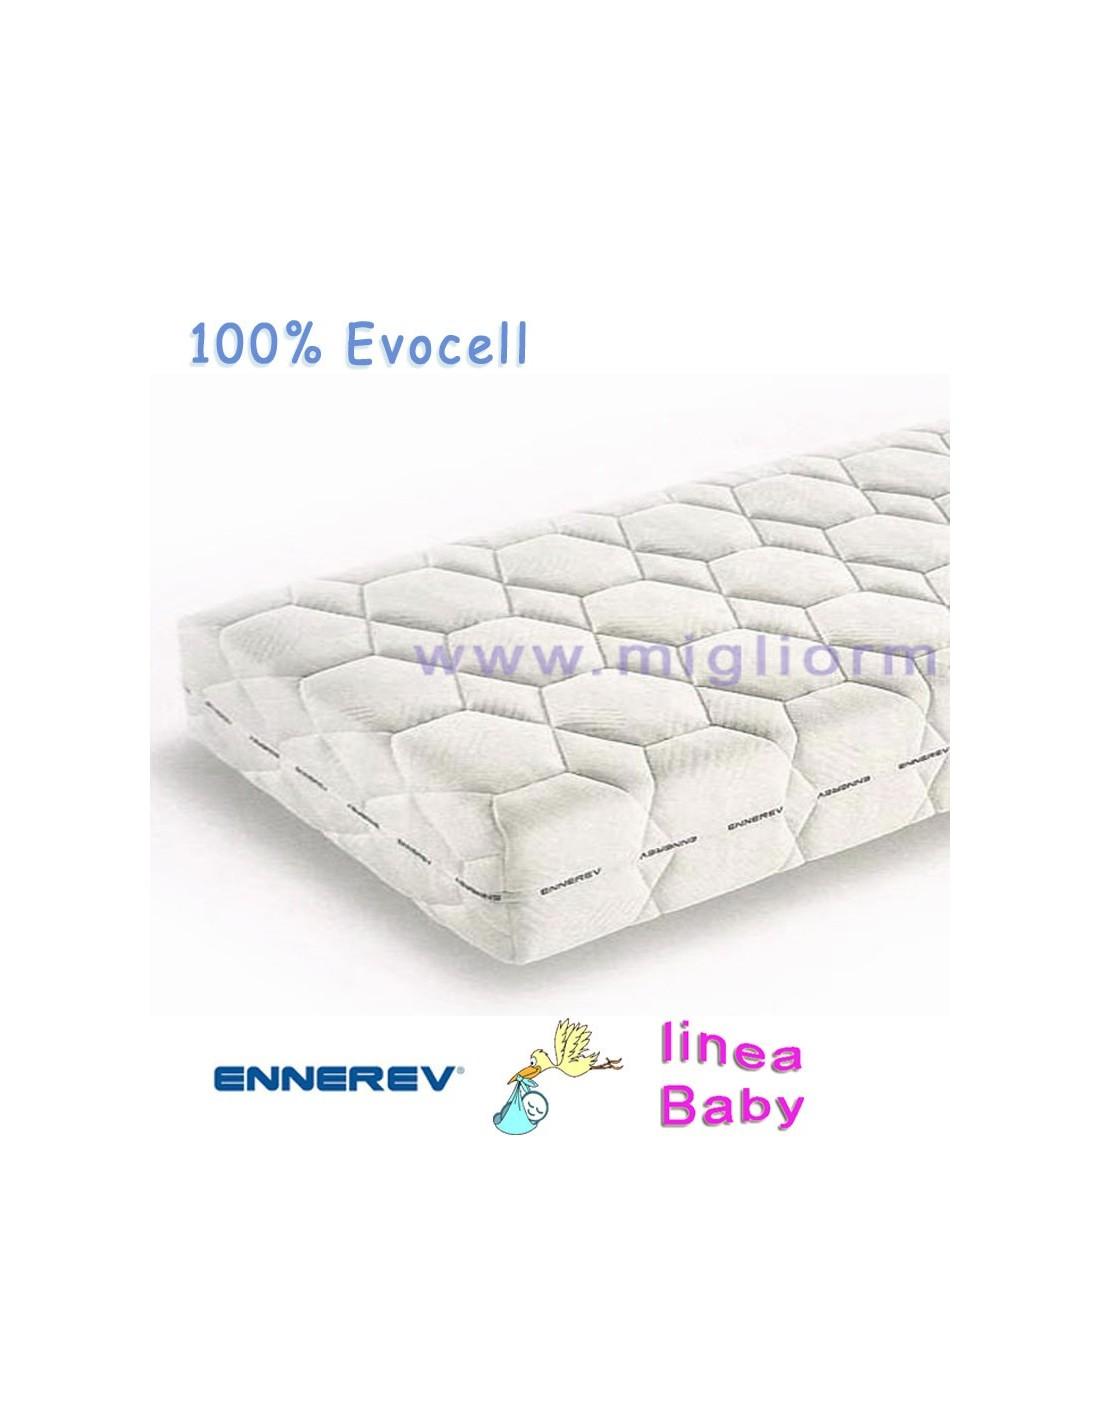 Materassi Ennerev Memory Foam.Baby Mattress By Ennerev Poppy